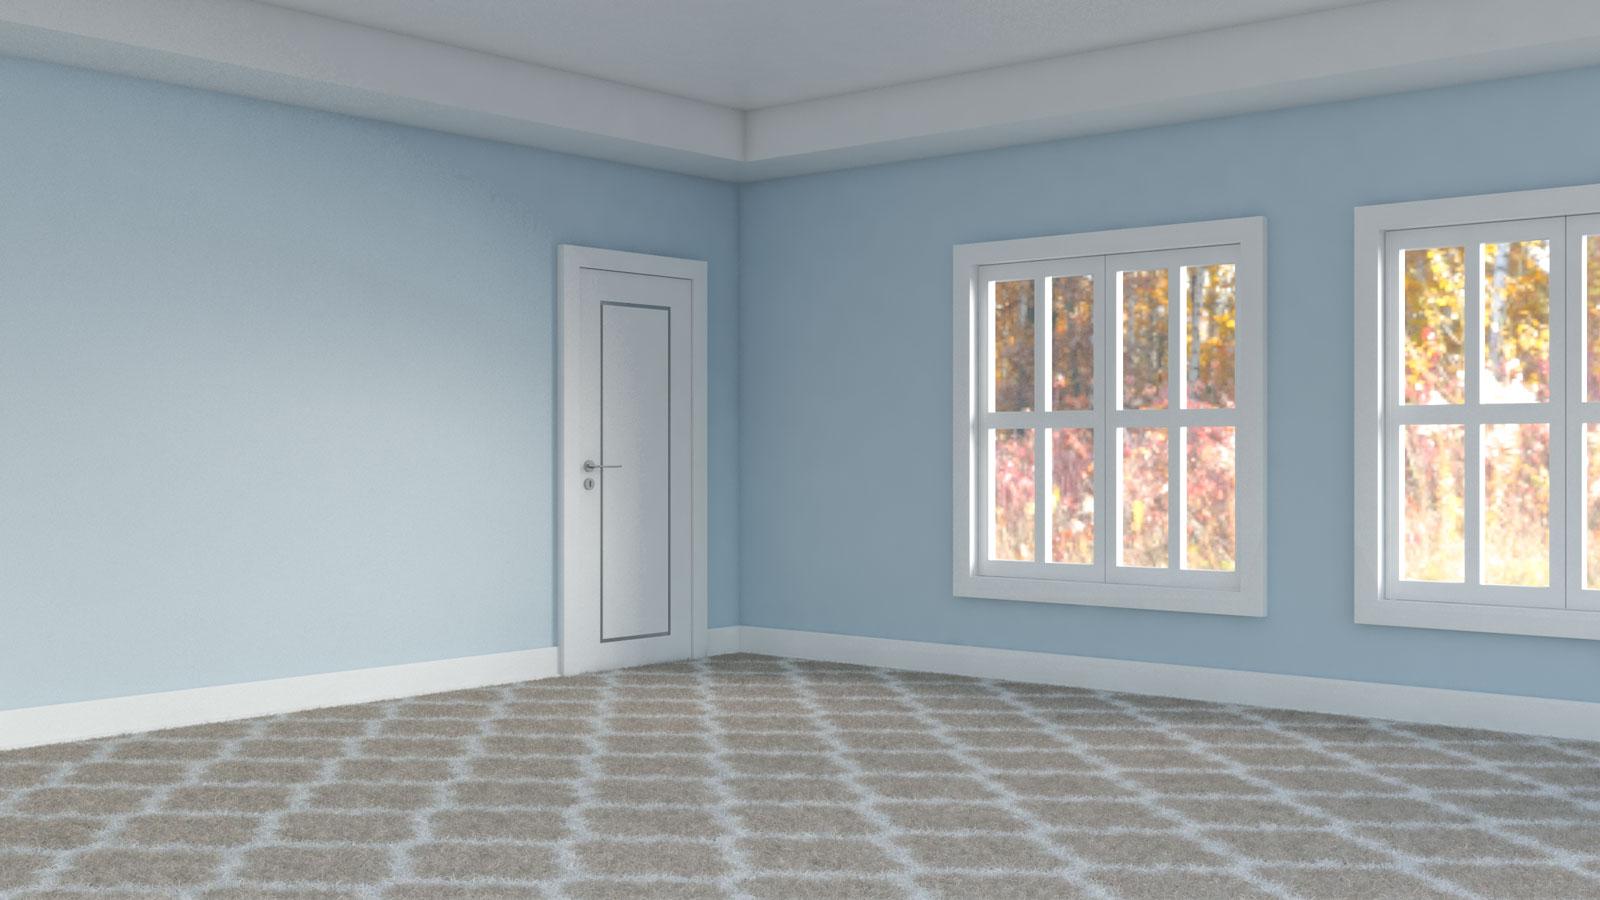 Brown and white carpet inside light blue room